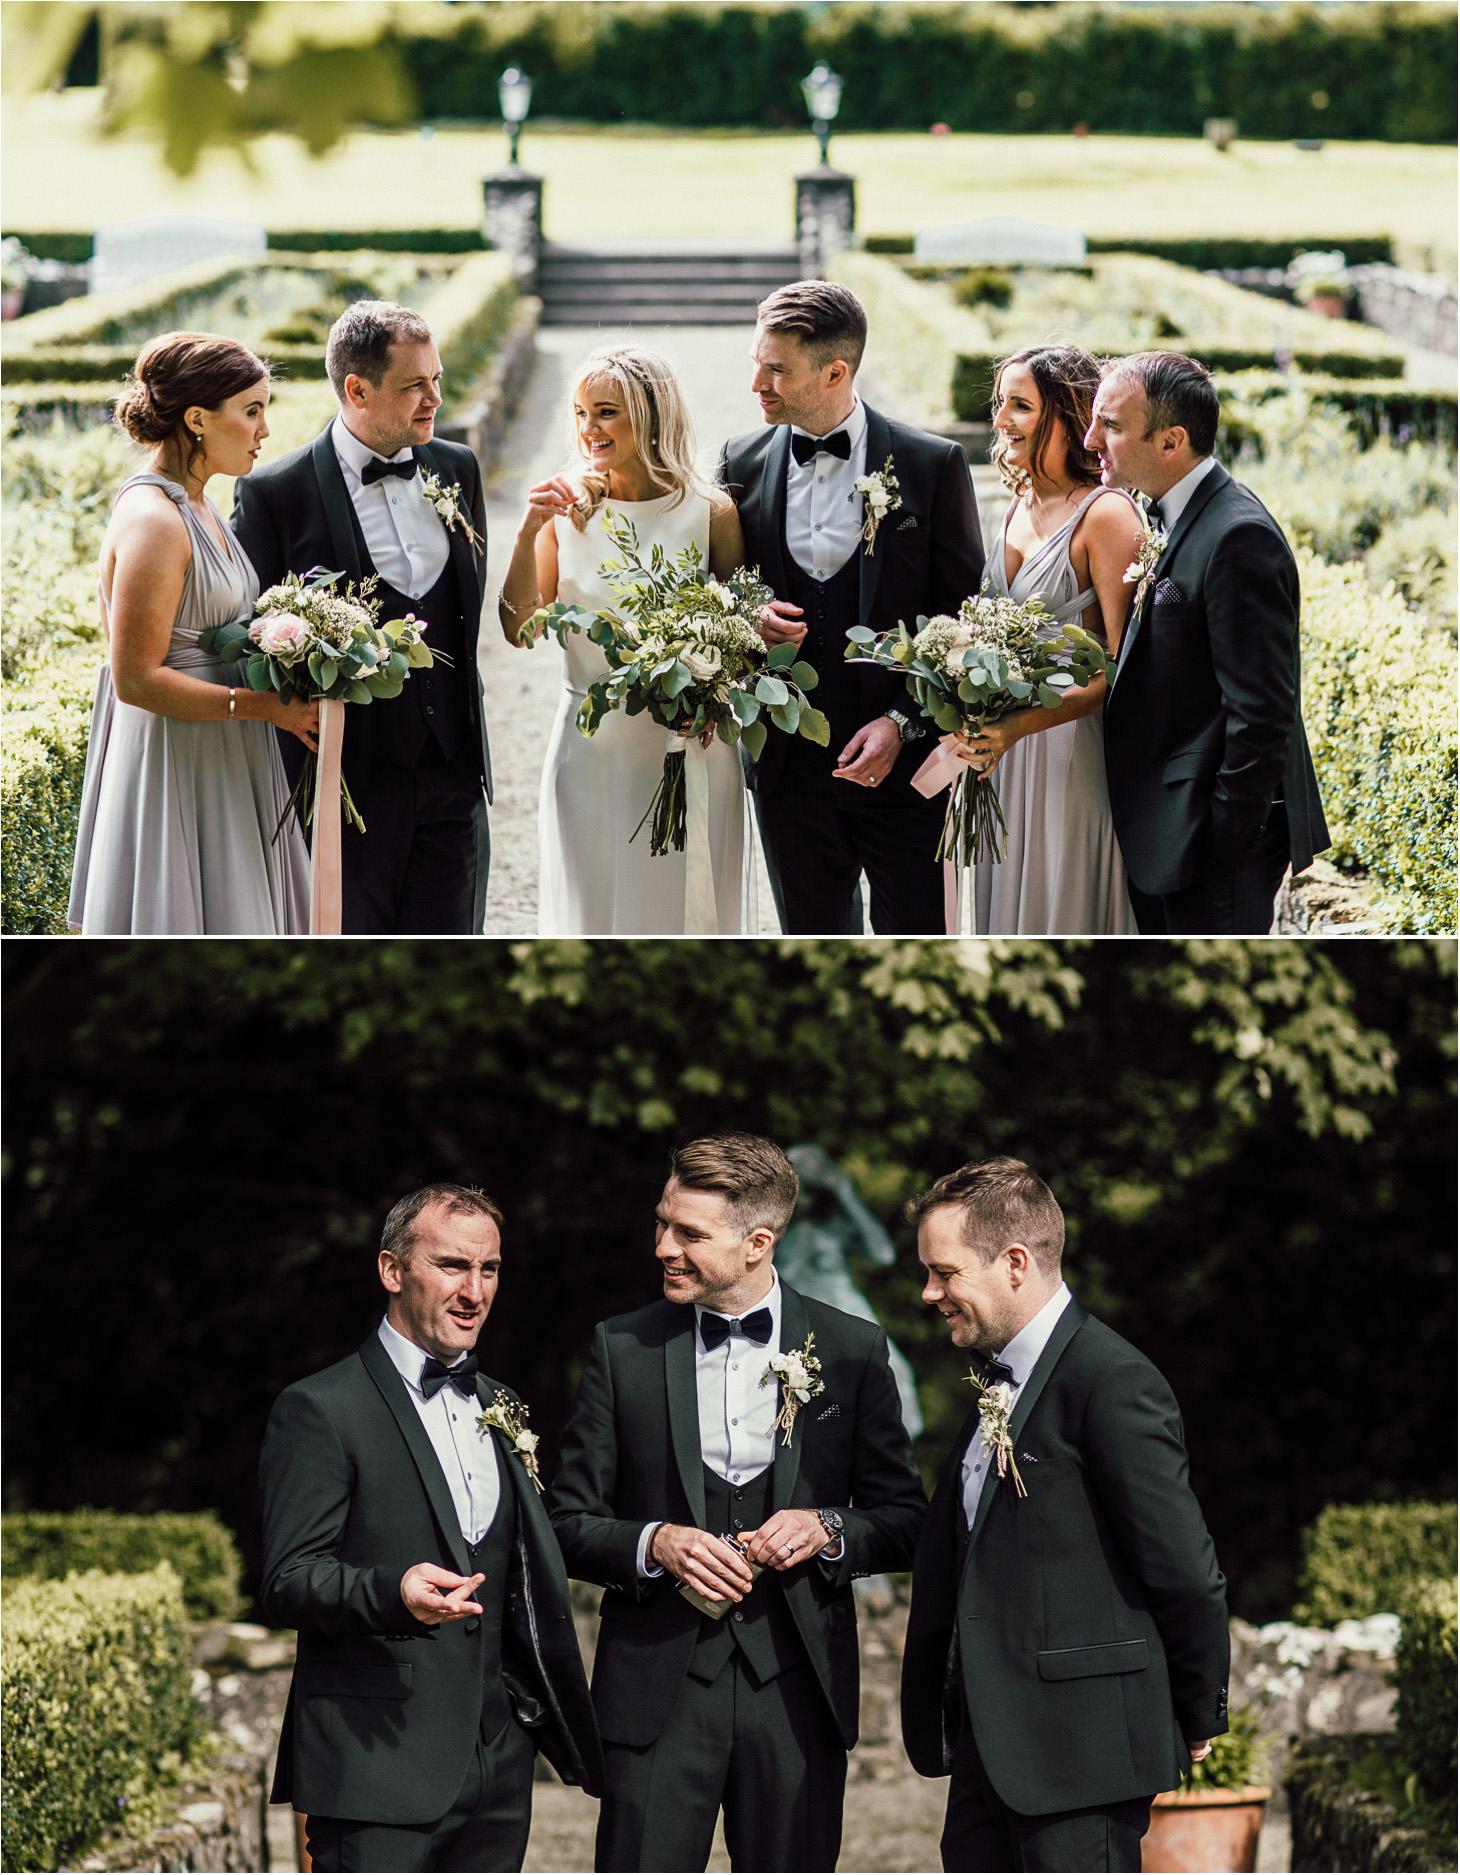 Virgina Lodge Photography. darren fitzpatrick. Wedding.15